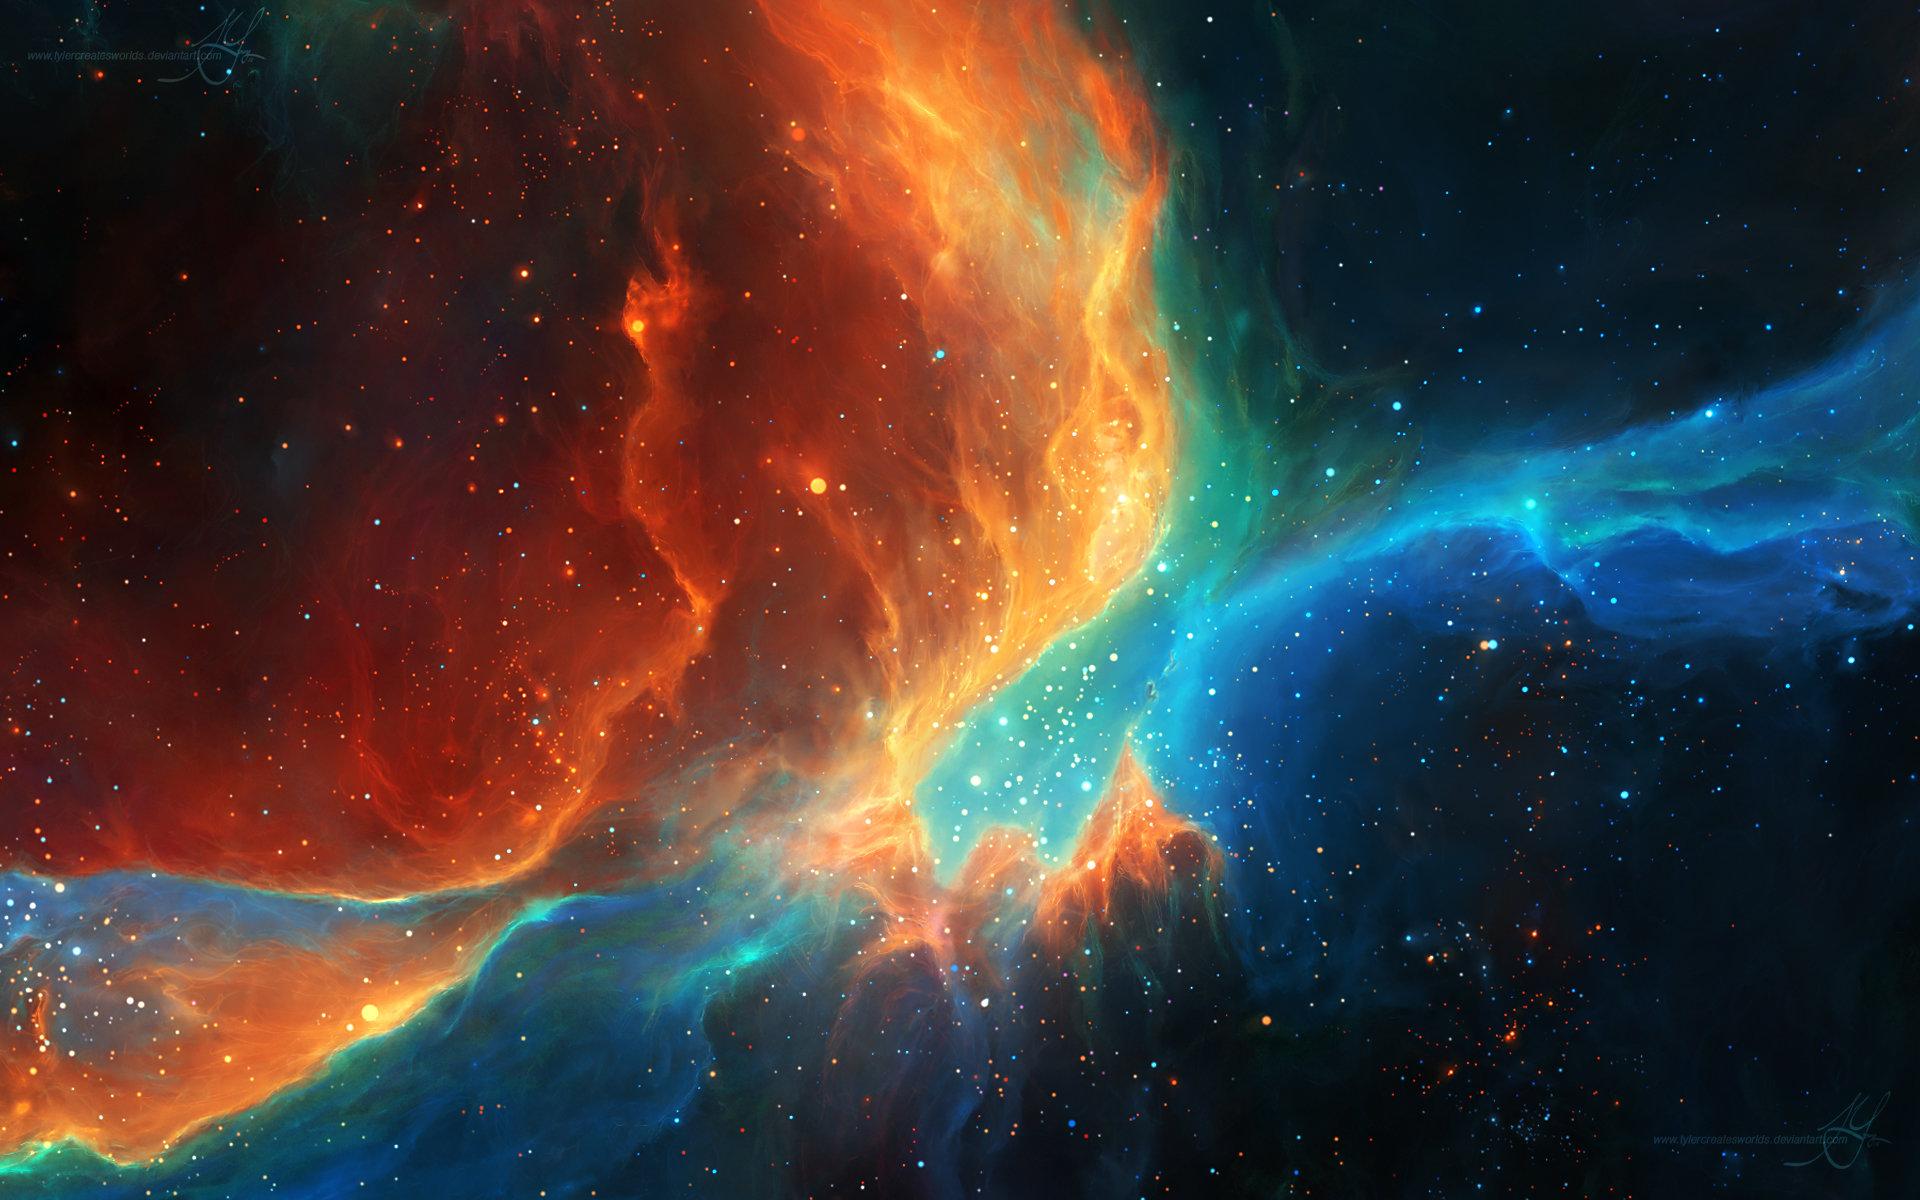 Best Nebula Wallpaper Id 91367 For High Resolution Hd 1920x1200 Pc